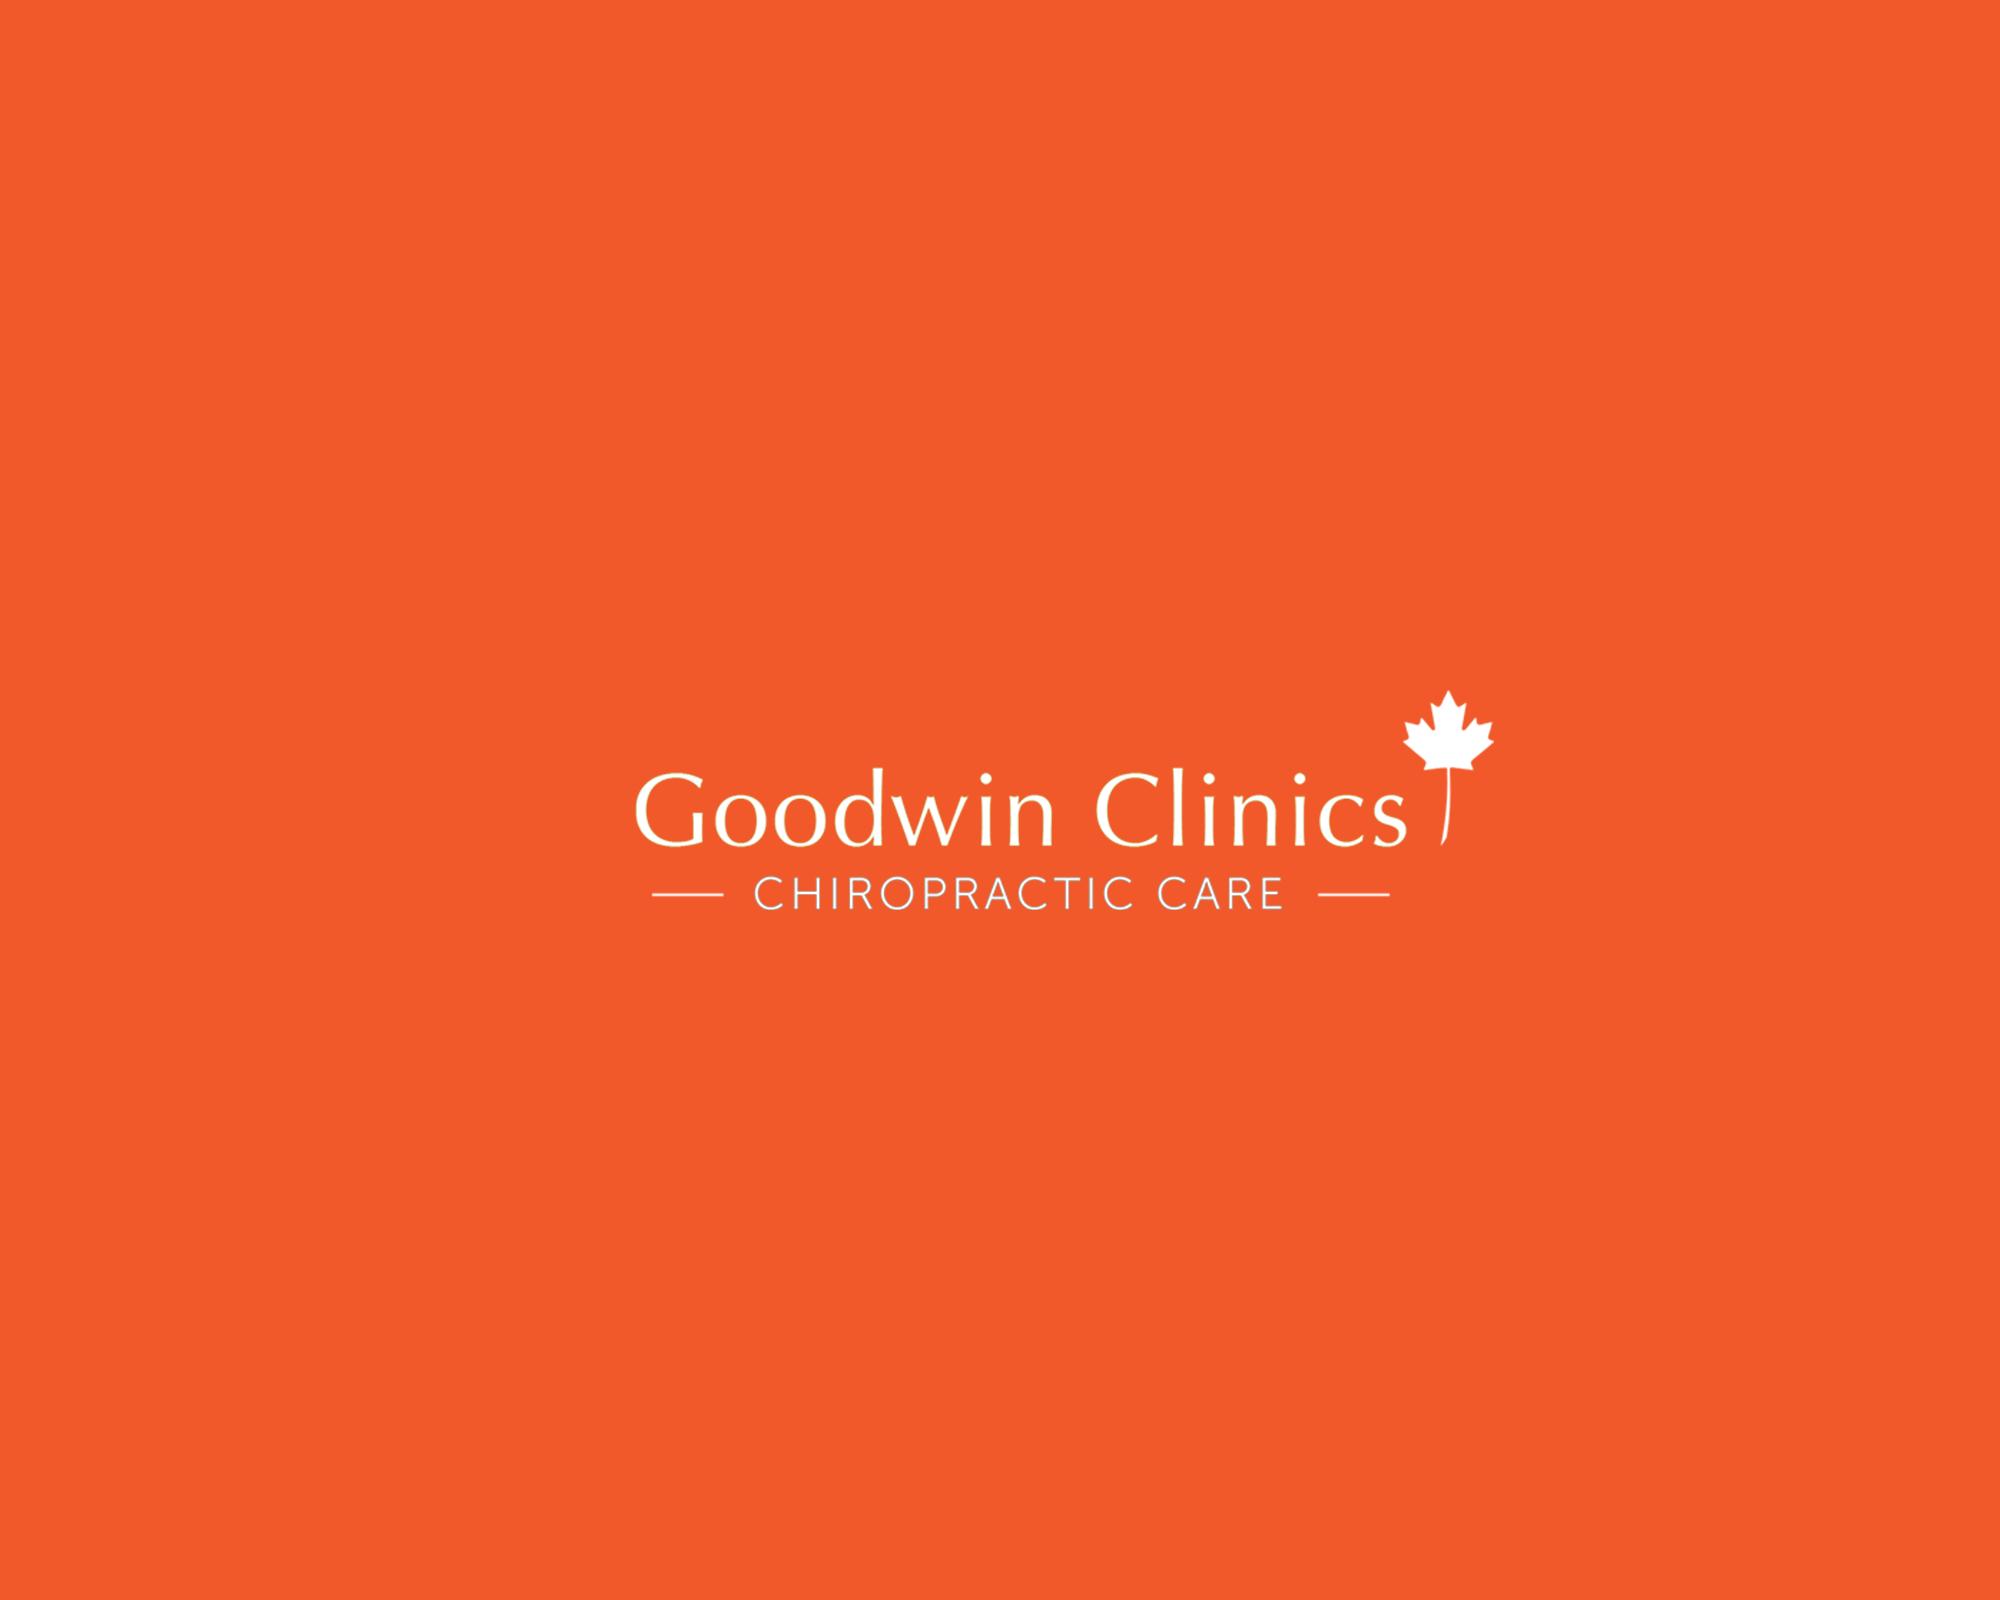 goodwin clinics Logo